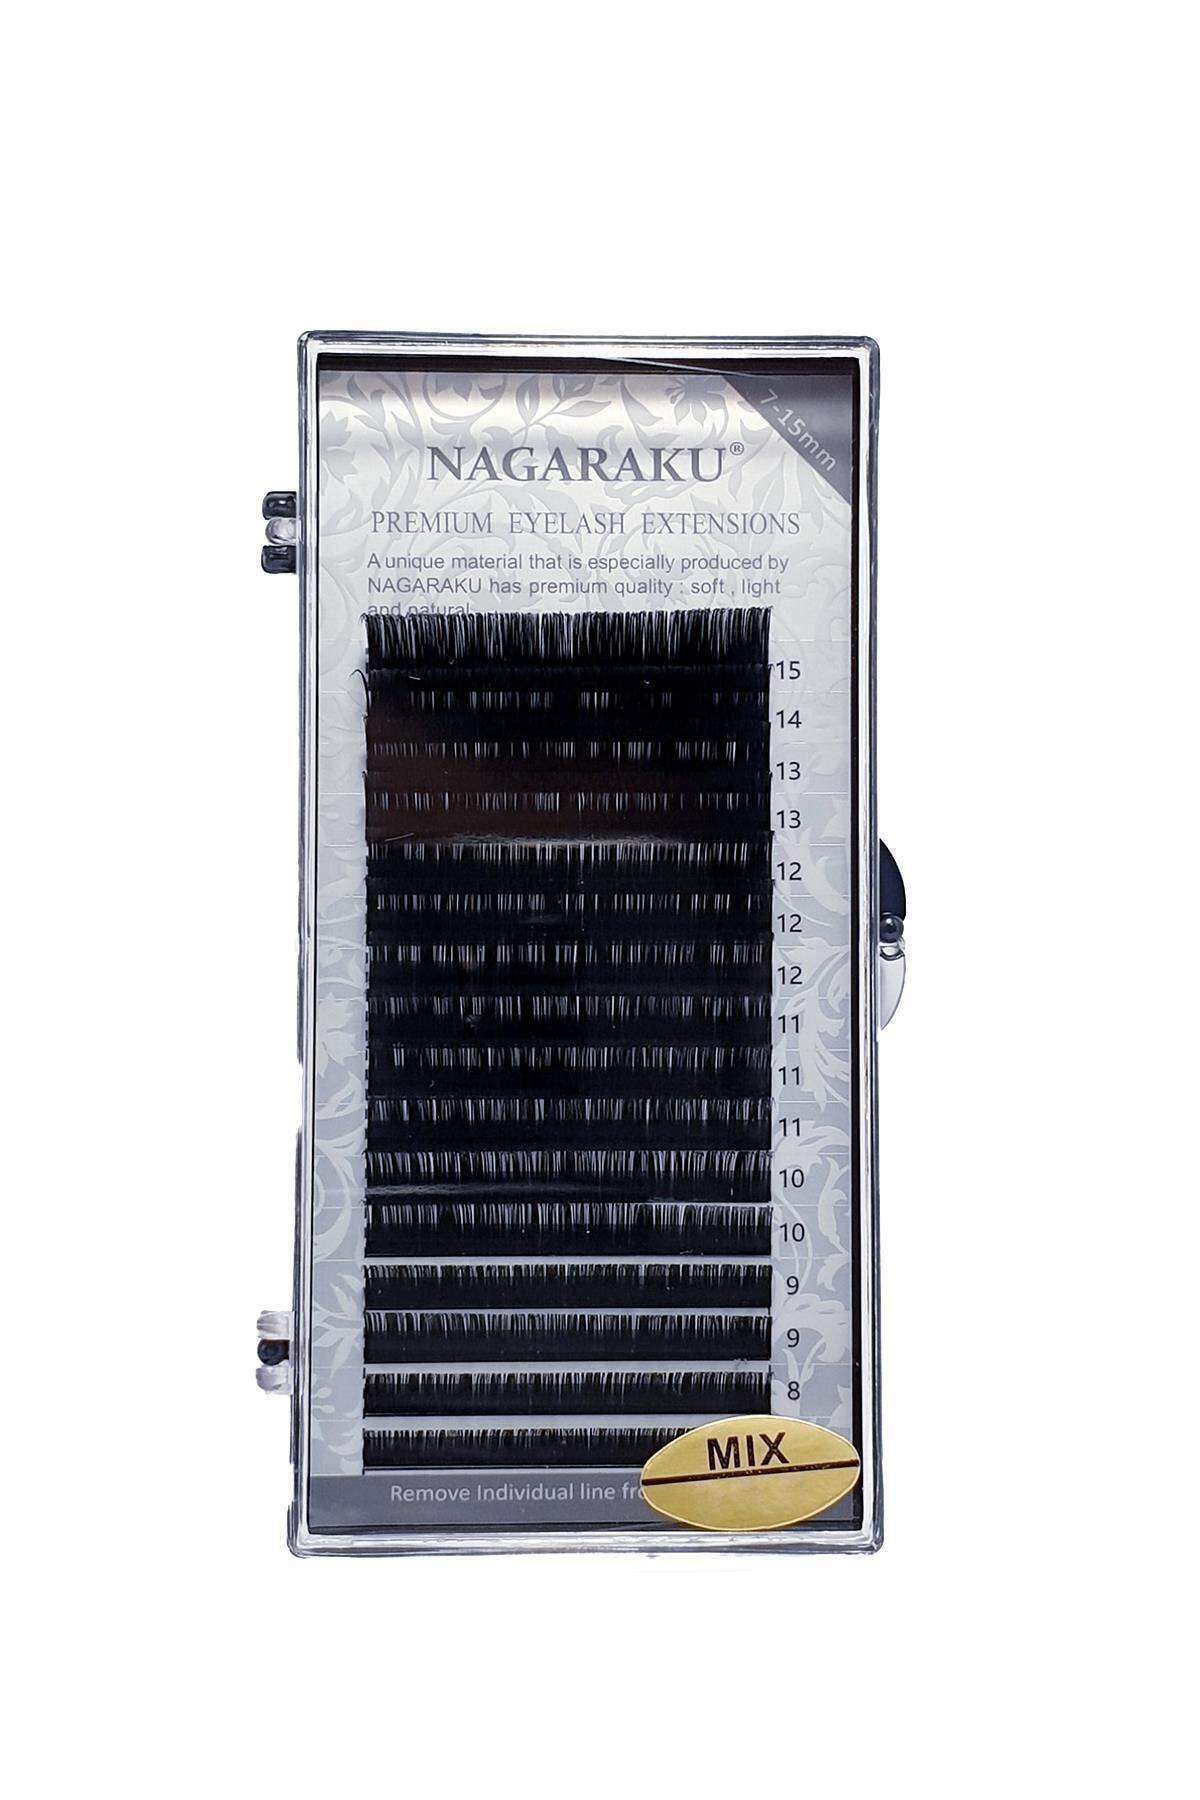 NAGARAKU Ipek Kirpik 0,07 D Kıvrım Mix Uzunluk 2